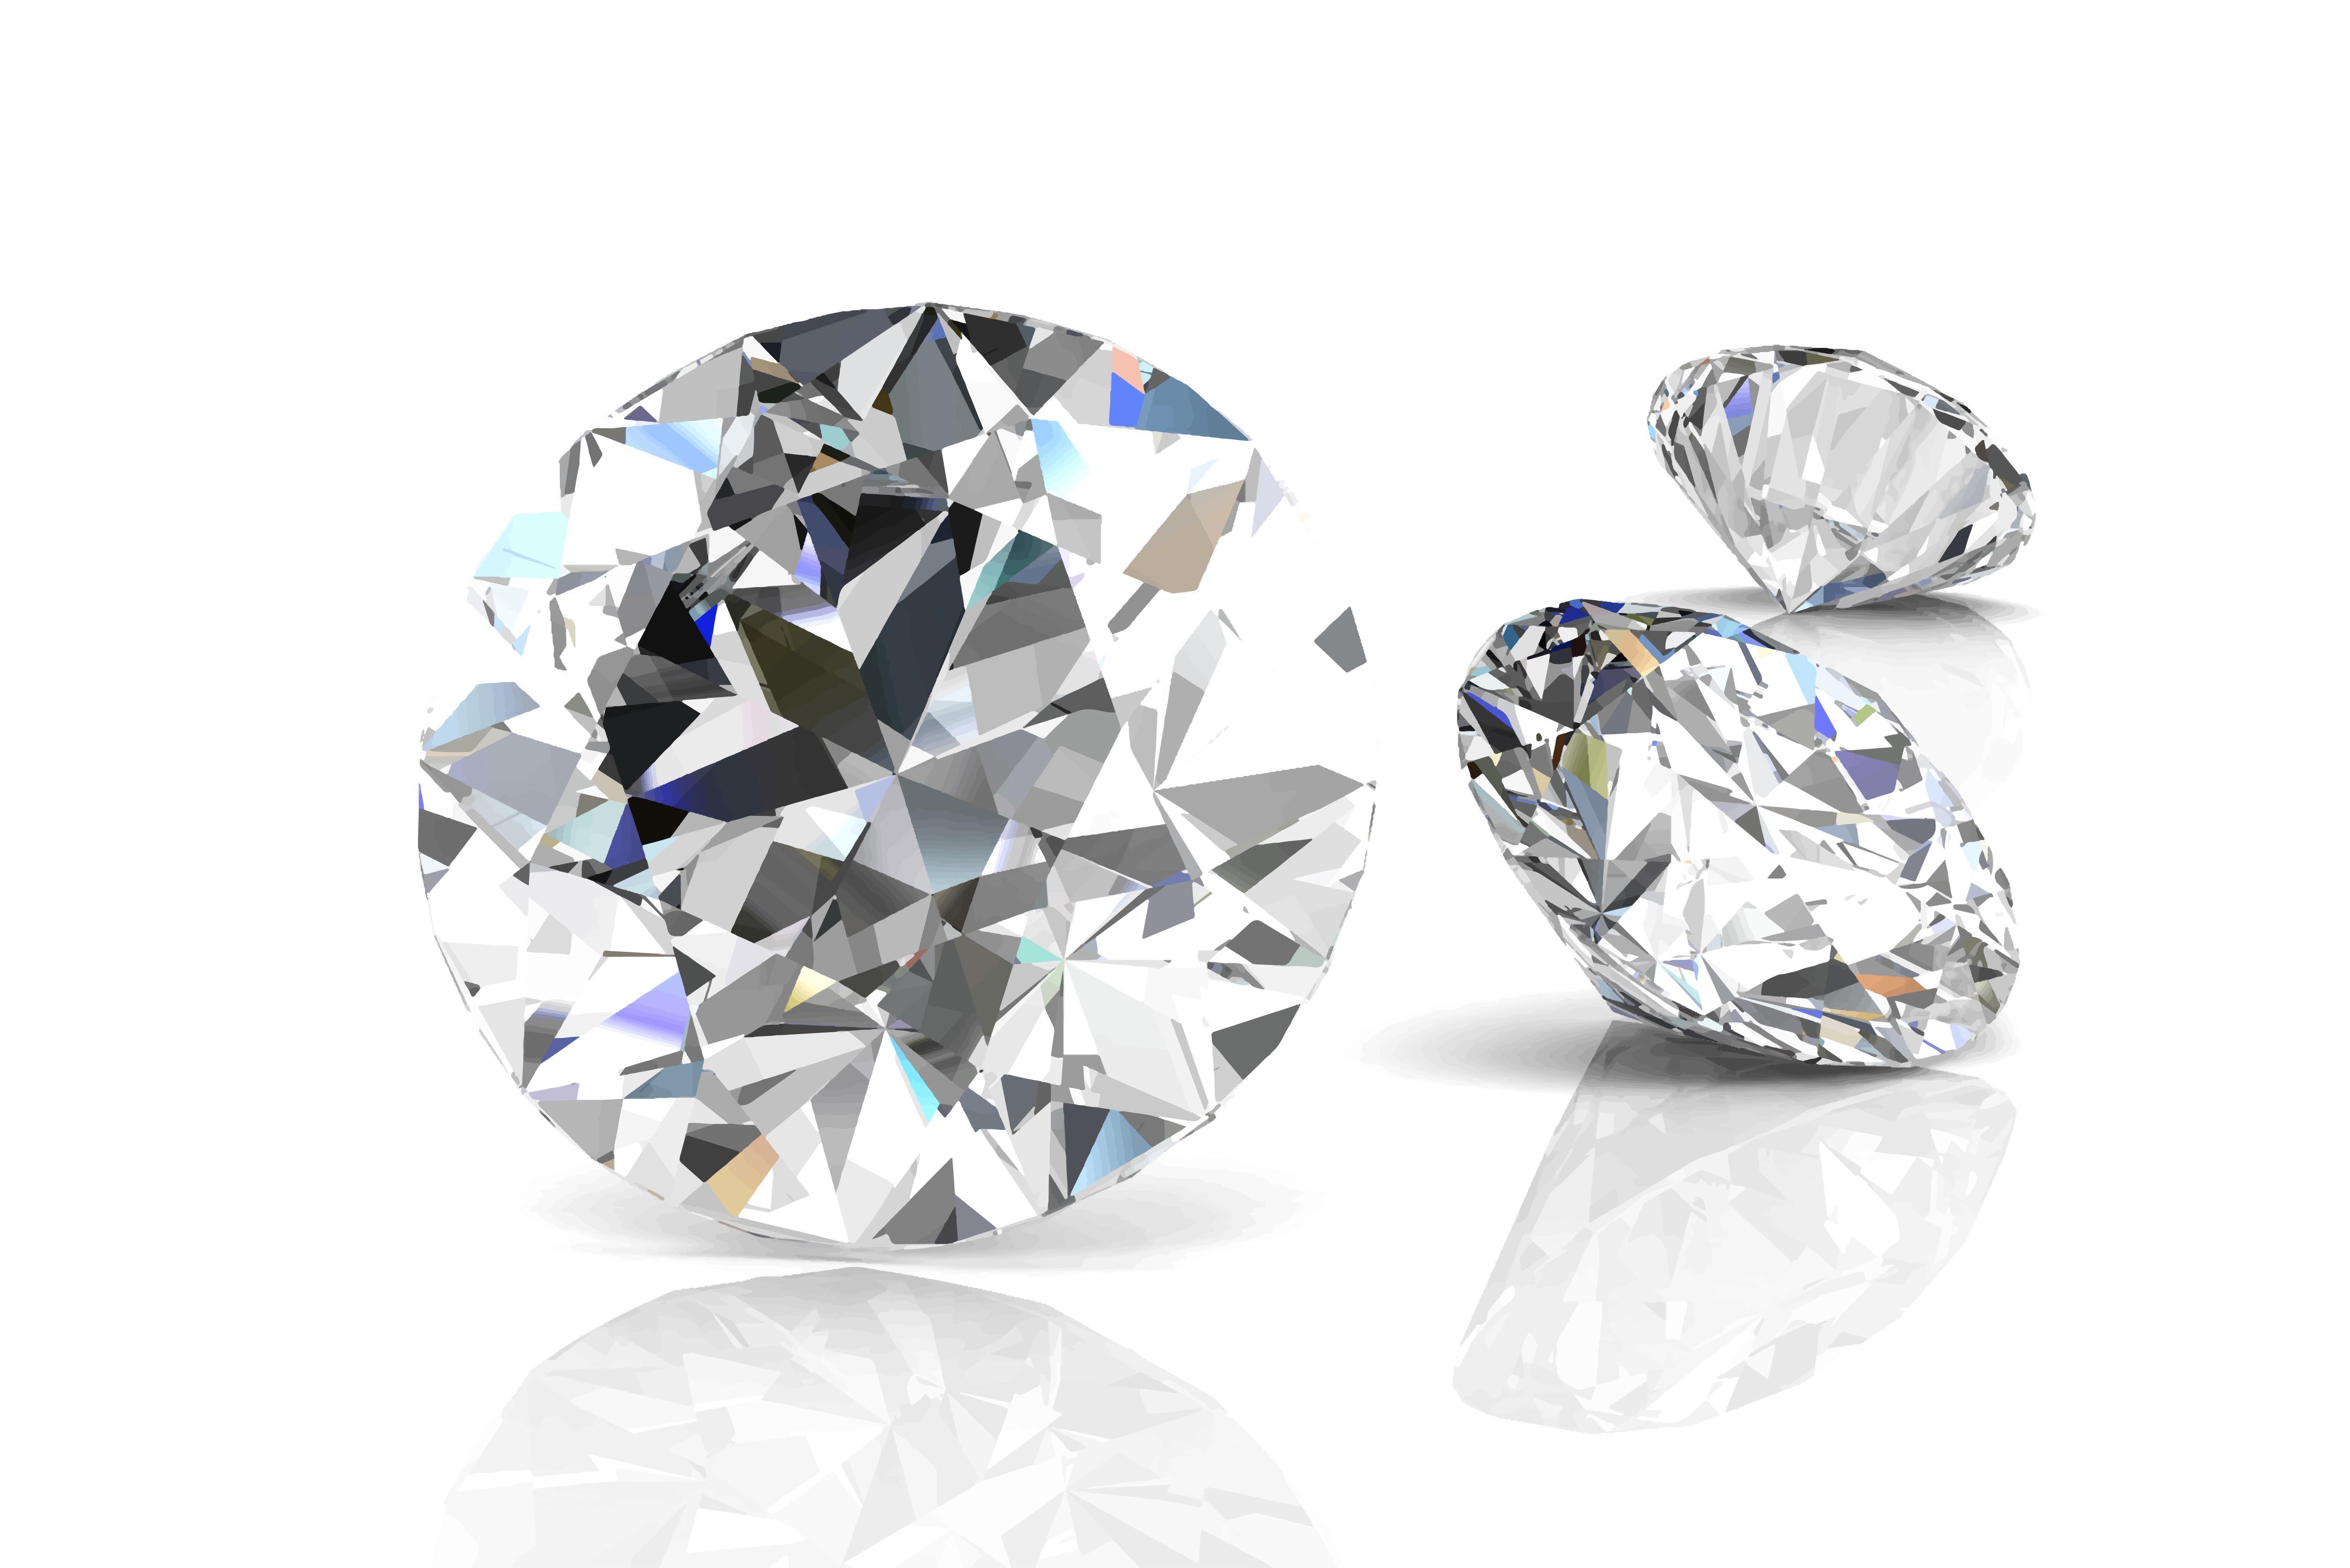 Wel e to DIAMOND INTERNATIONAL CORPORATION